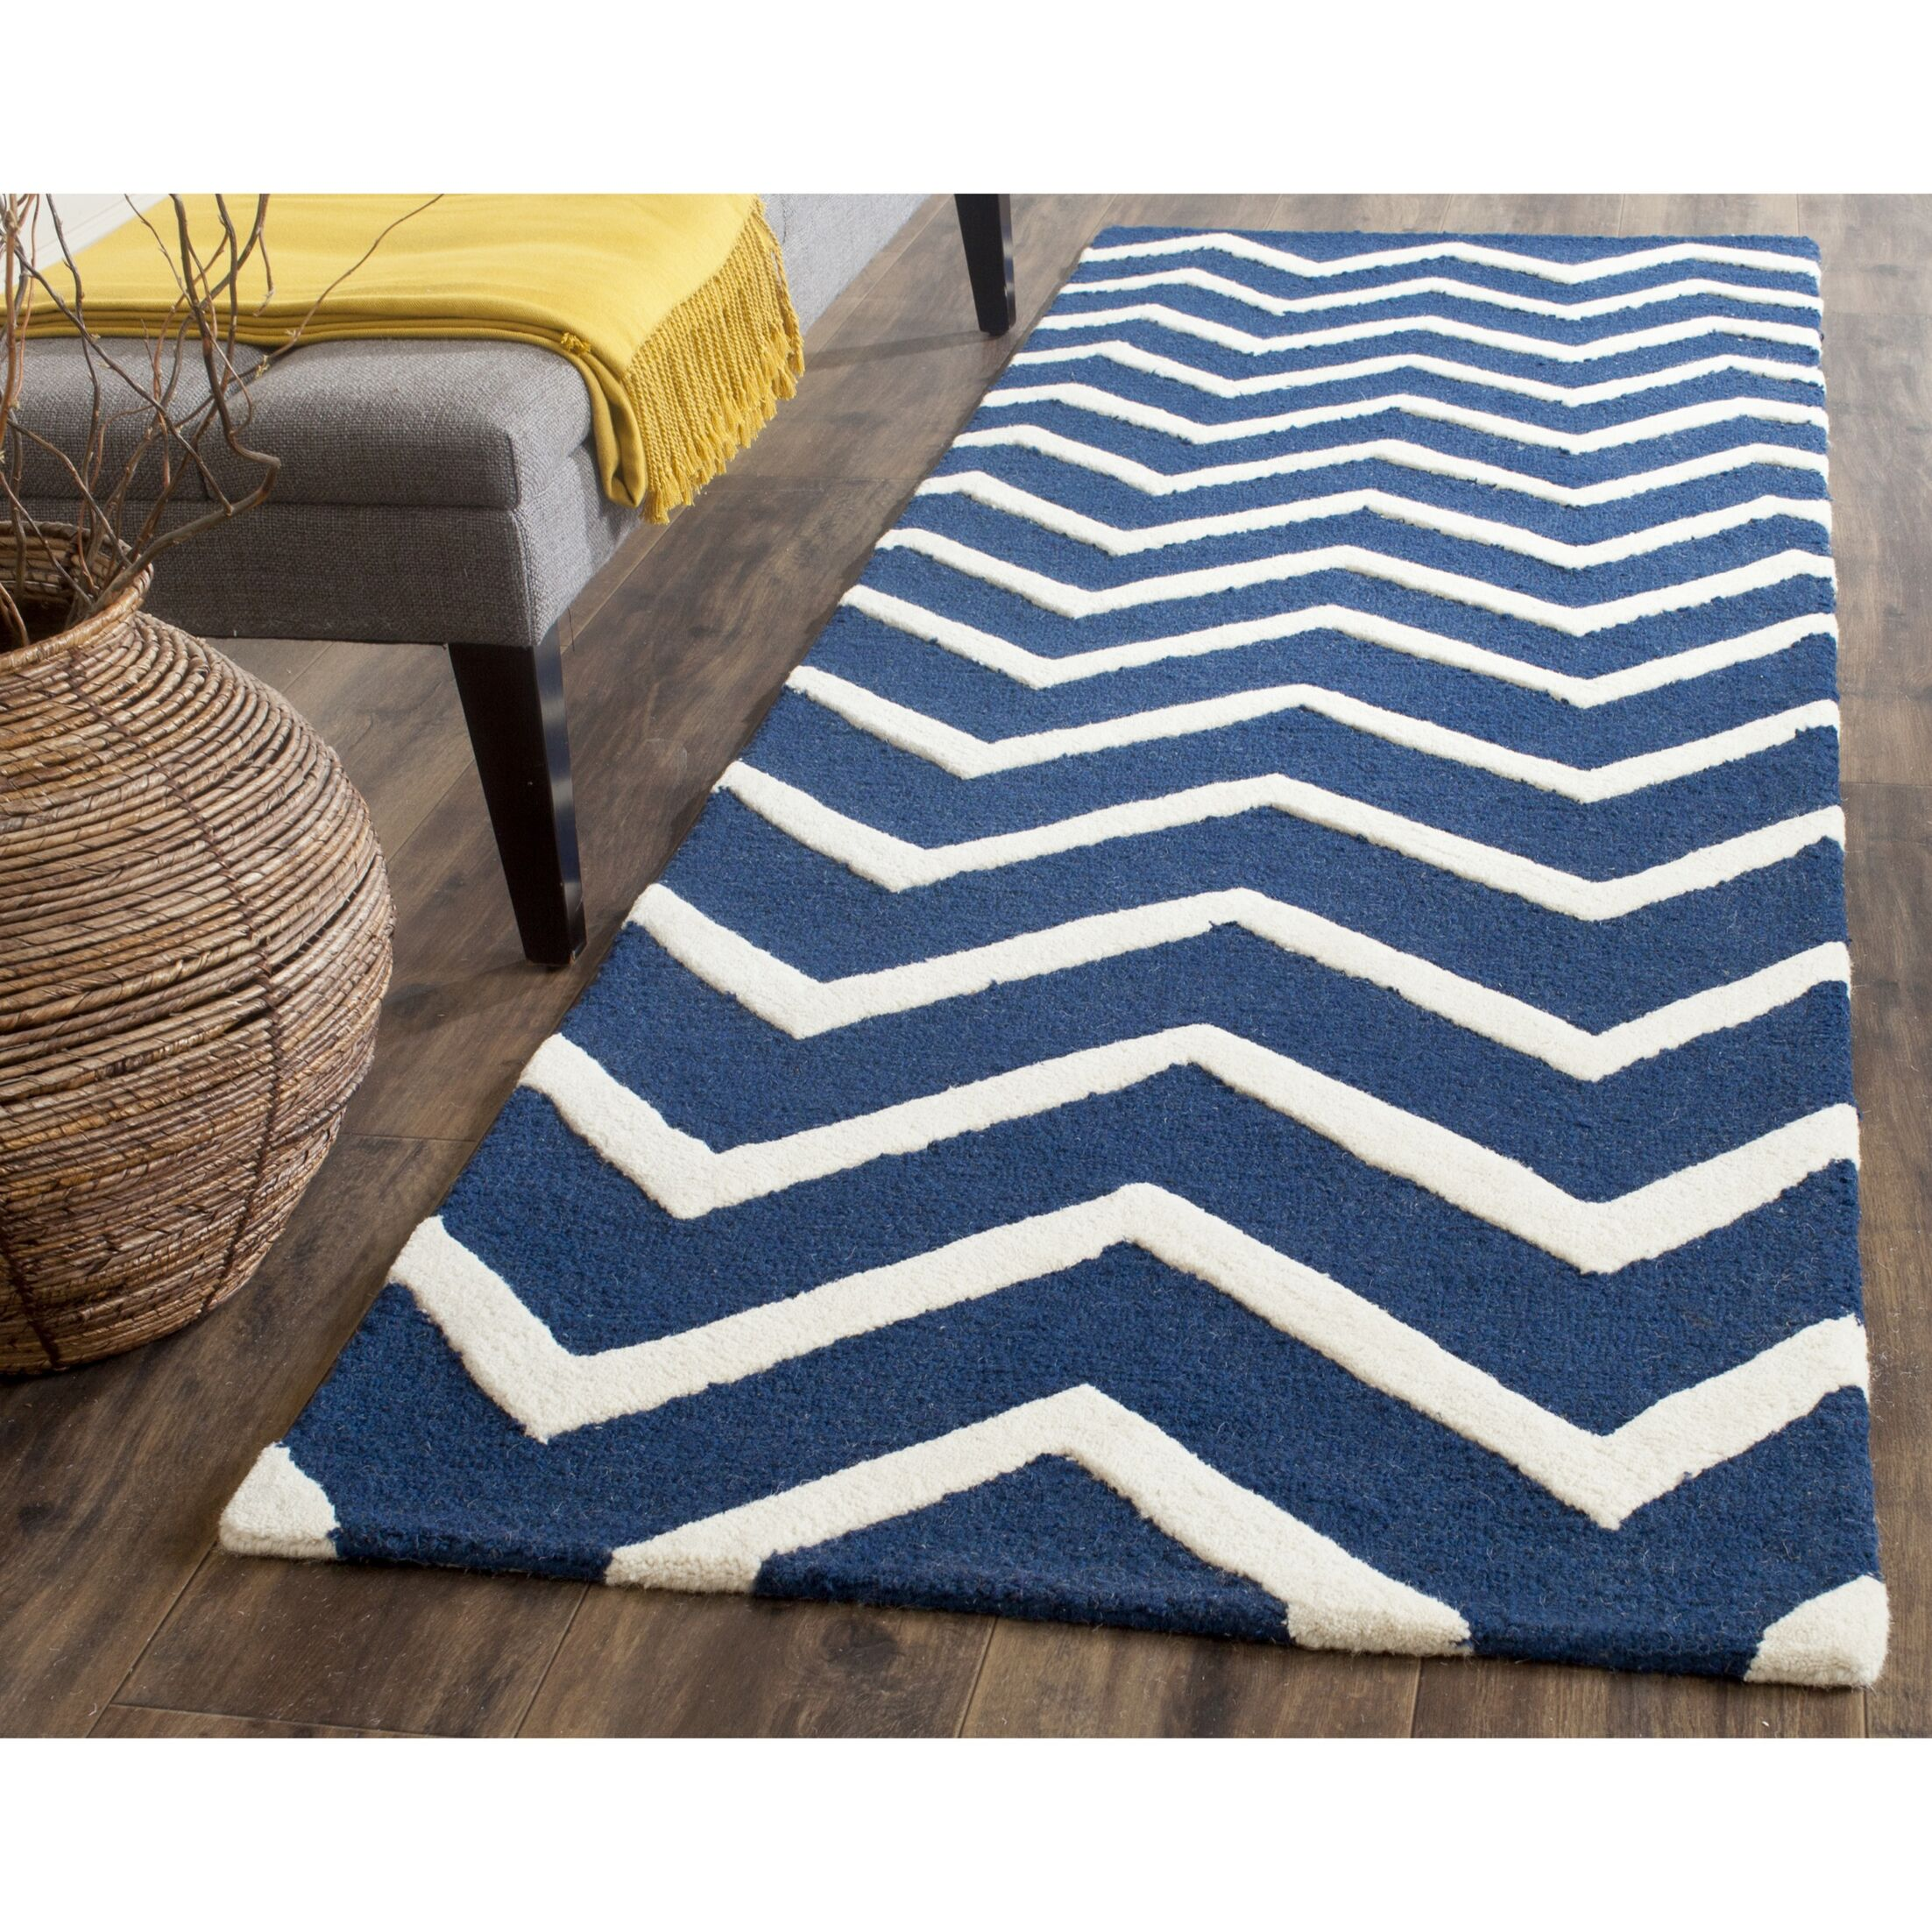 Charlenne Hand-Tufted Wool Blue/Ivory Area Rug Rug Size: Runner 2'6